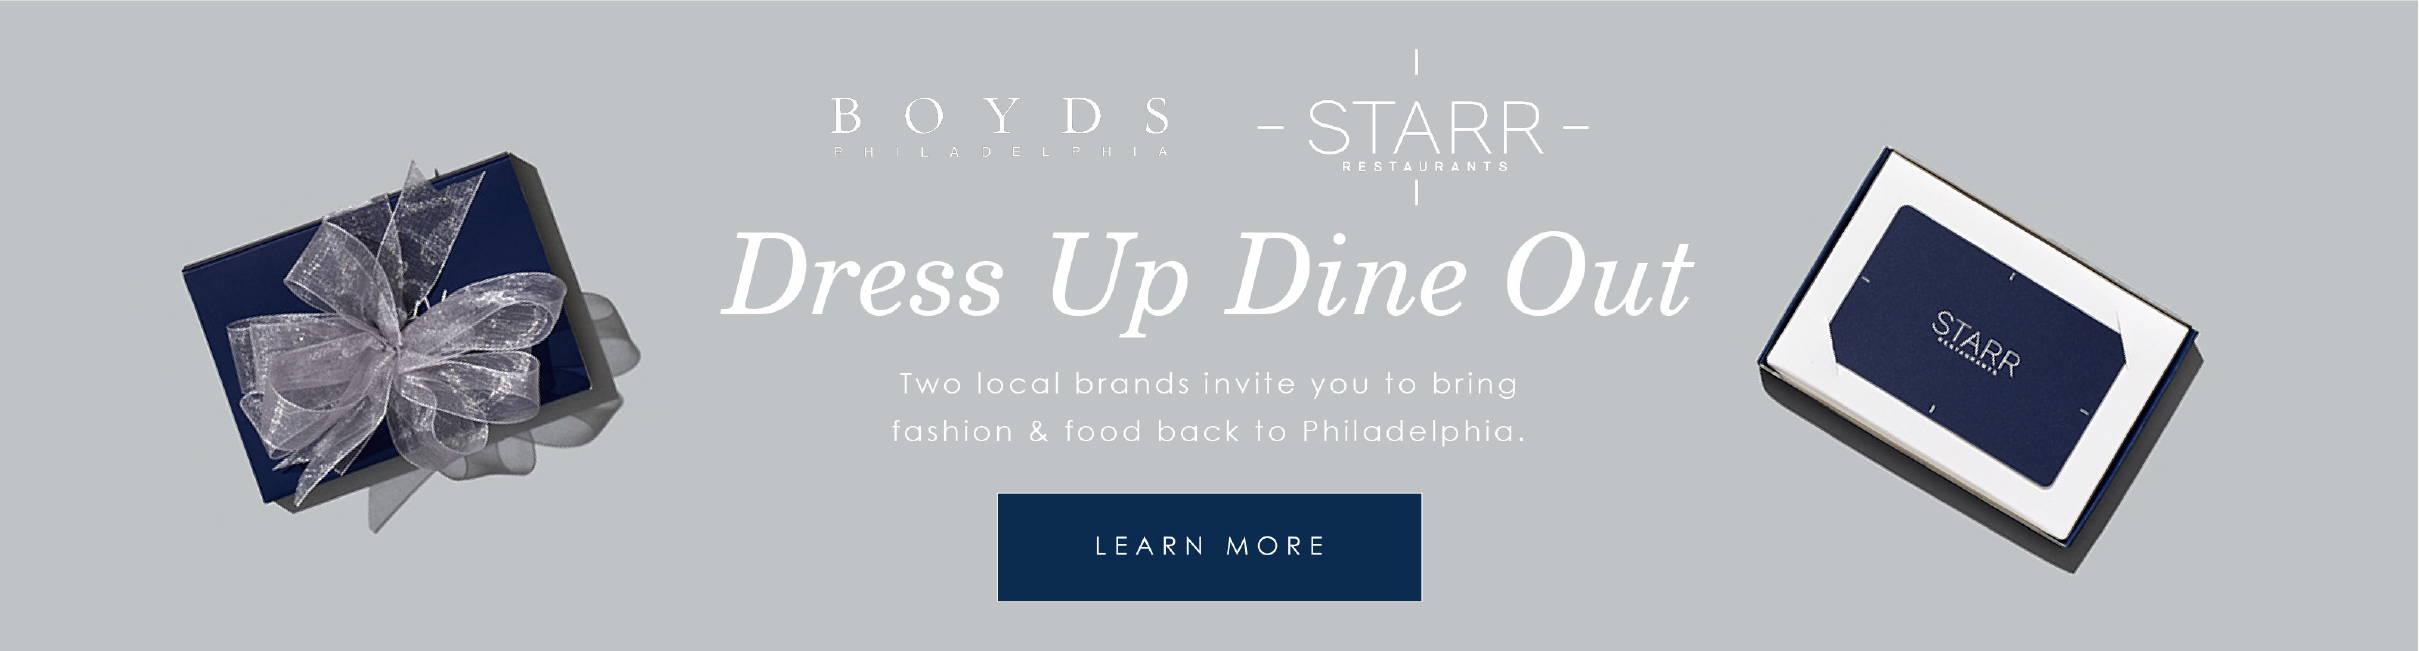 Boyds & Starr - Dress Up & Dine Out